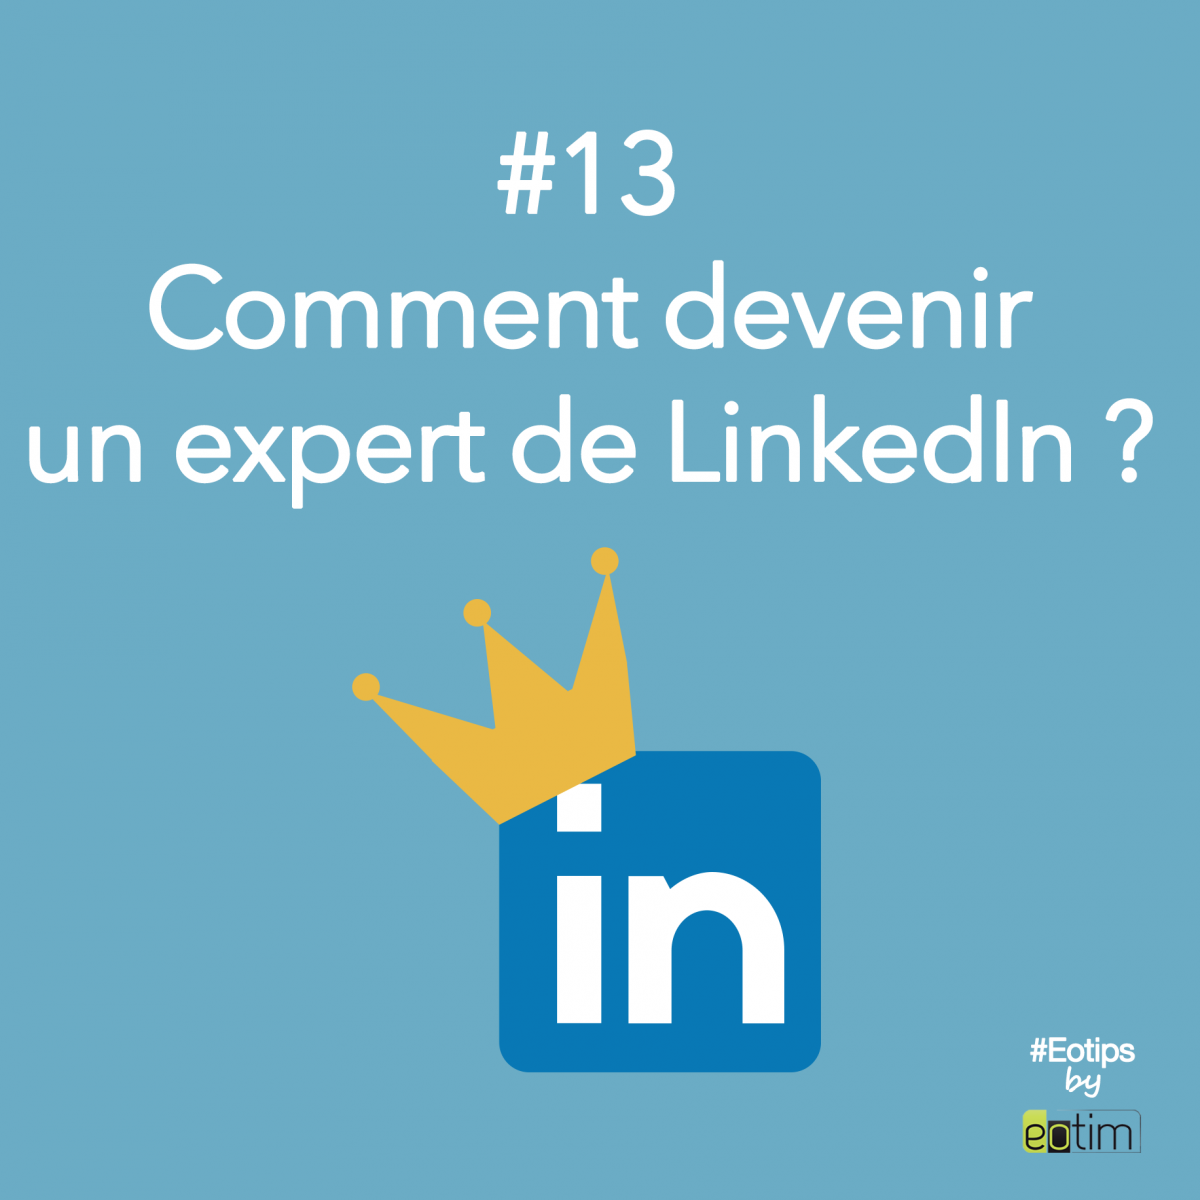 Eotips #13 : Comment devenir un expert de LinkedIn ?